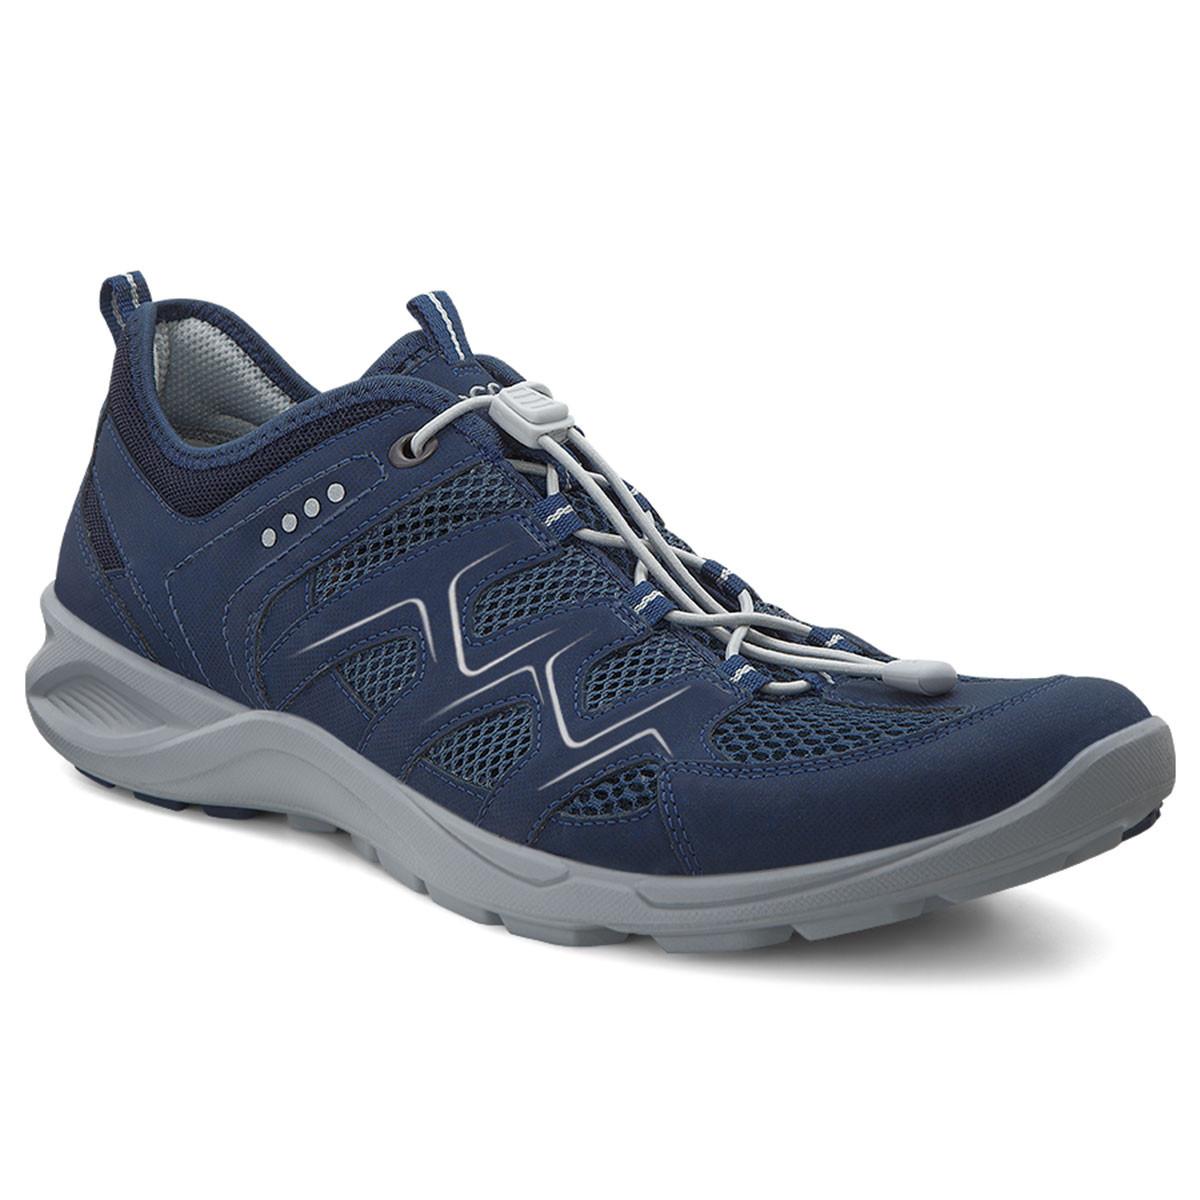 3f9ce6a6fc70 Ecco Mens Terracruise Trail Shoe Trainers